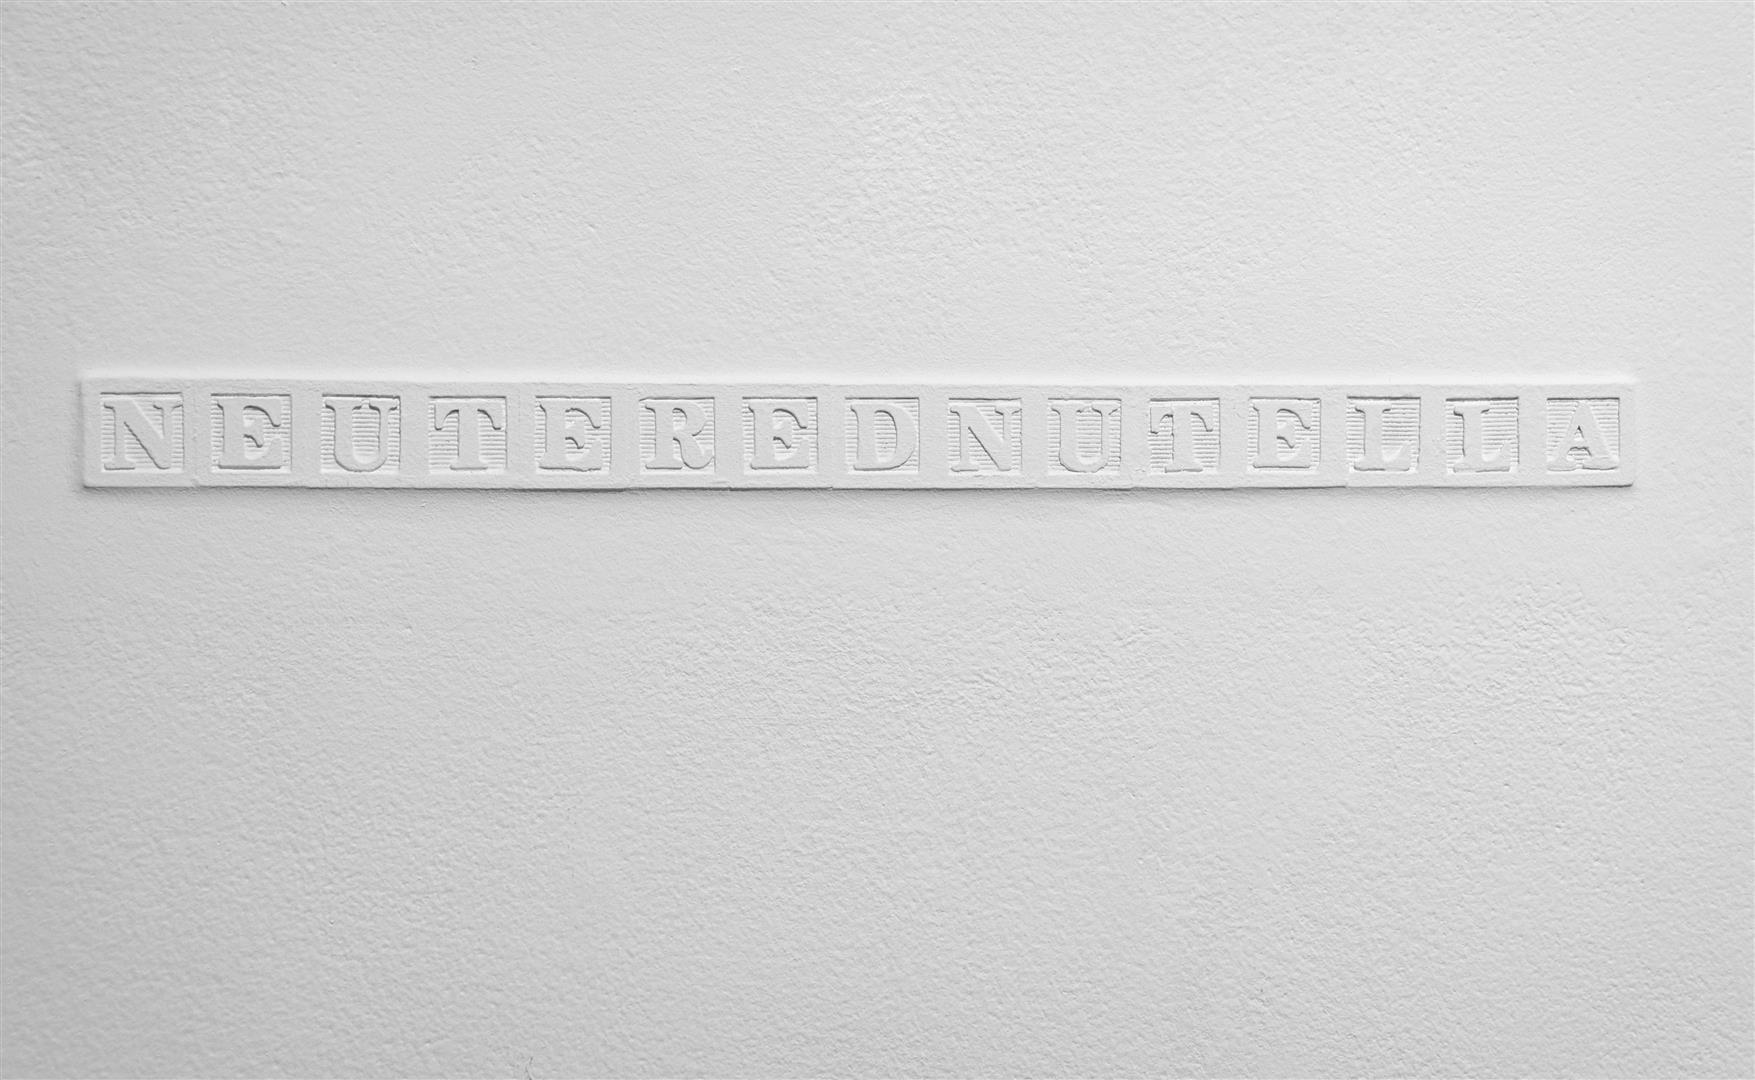 "NEUTEREDNUTELLA   Alphabet blocks embedded in drywall, wall paint  1¼ x 17¾""/ 2012"